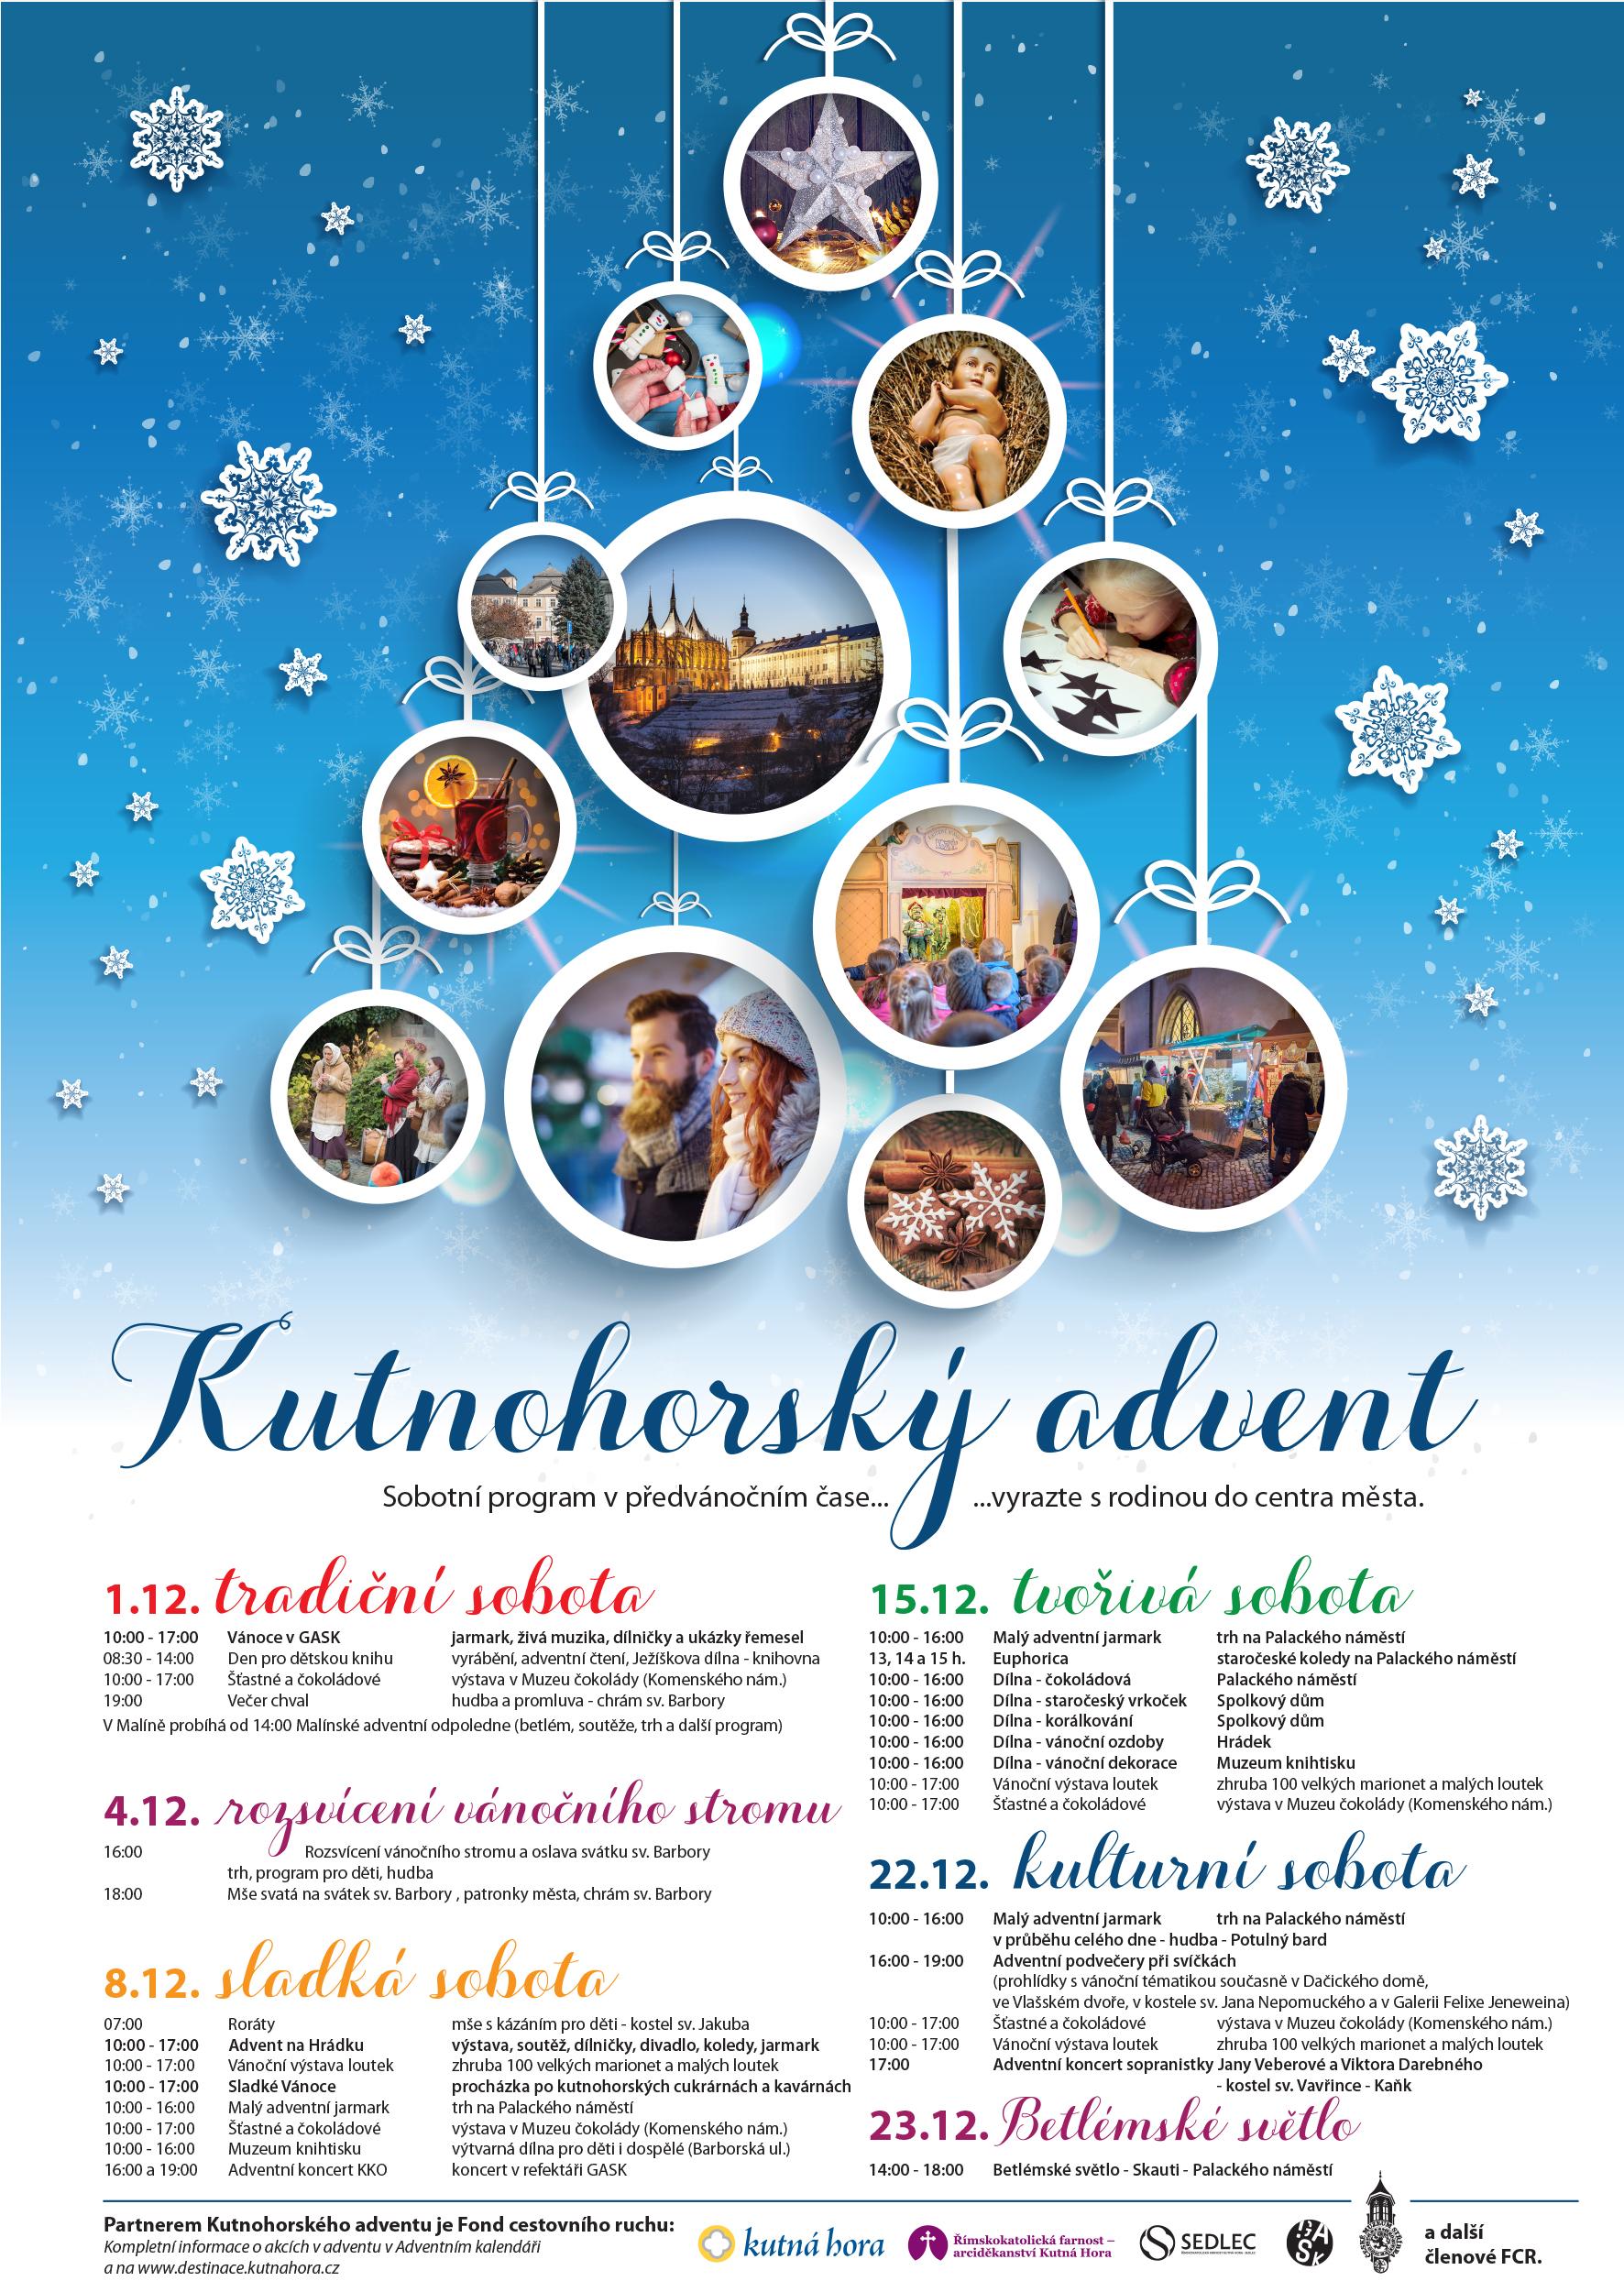 4744-kutnohorsky-advent.jpg